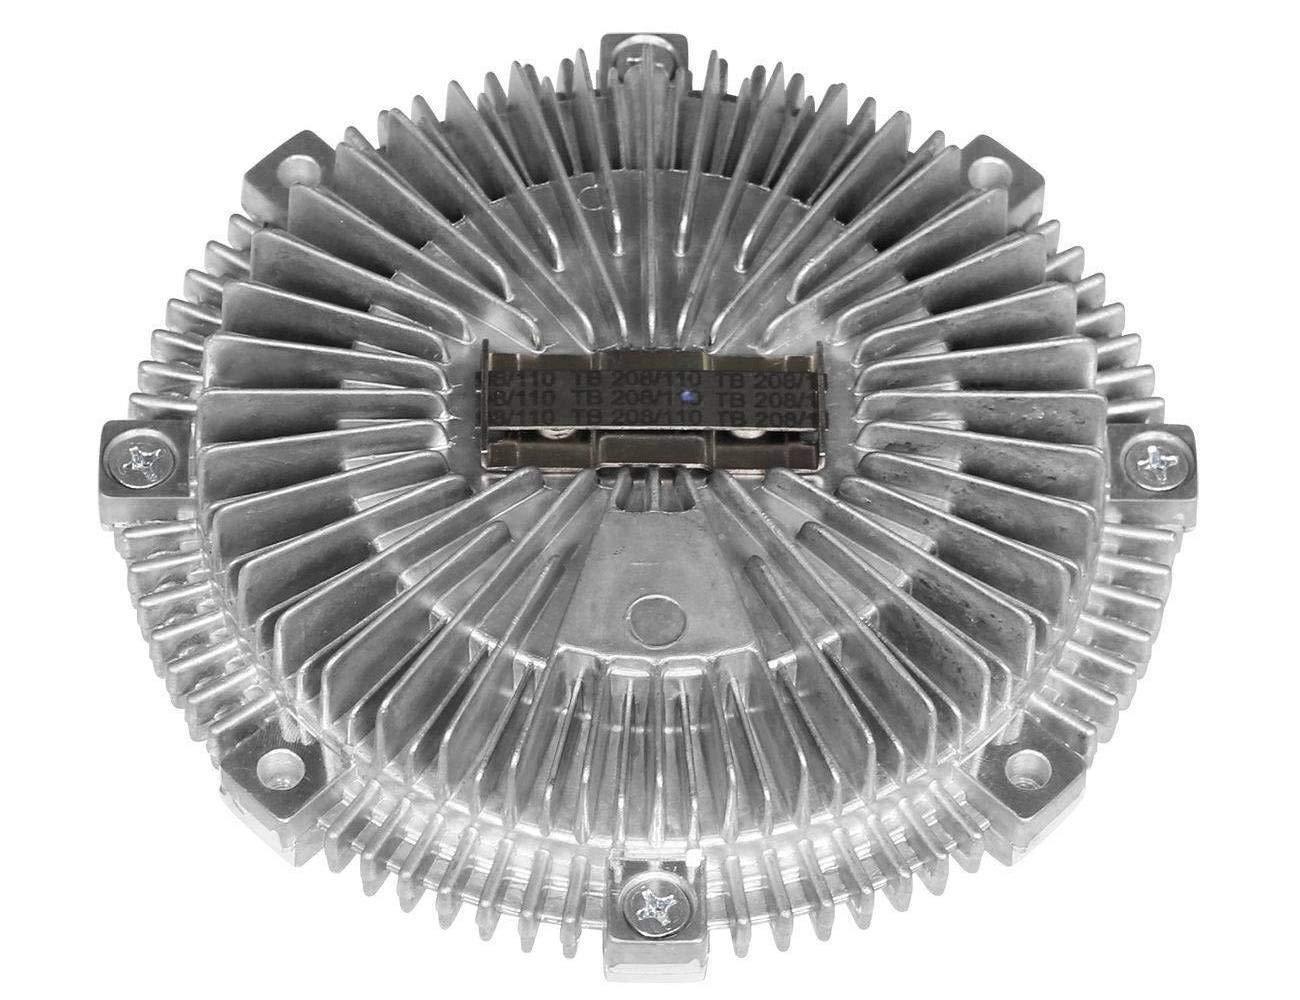 TOPAZ 6231 Engine Cooling Thermal Fan Clutch for Mitsubishi Montero 01-06 3.5L 3.8L V6